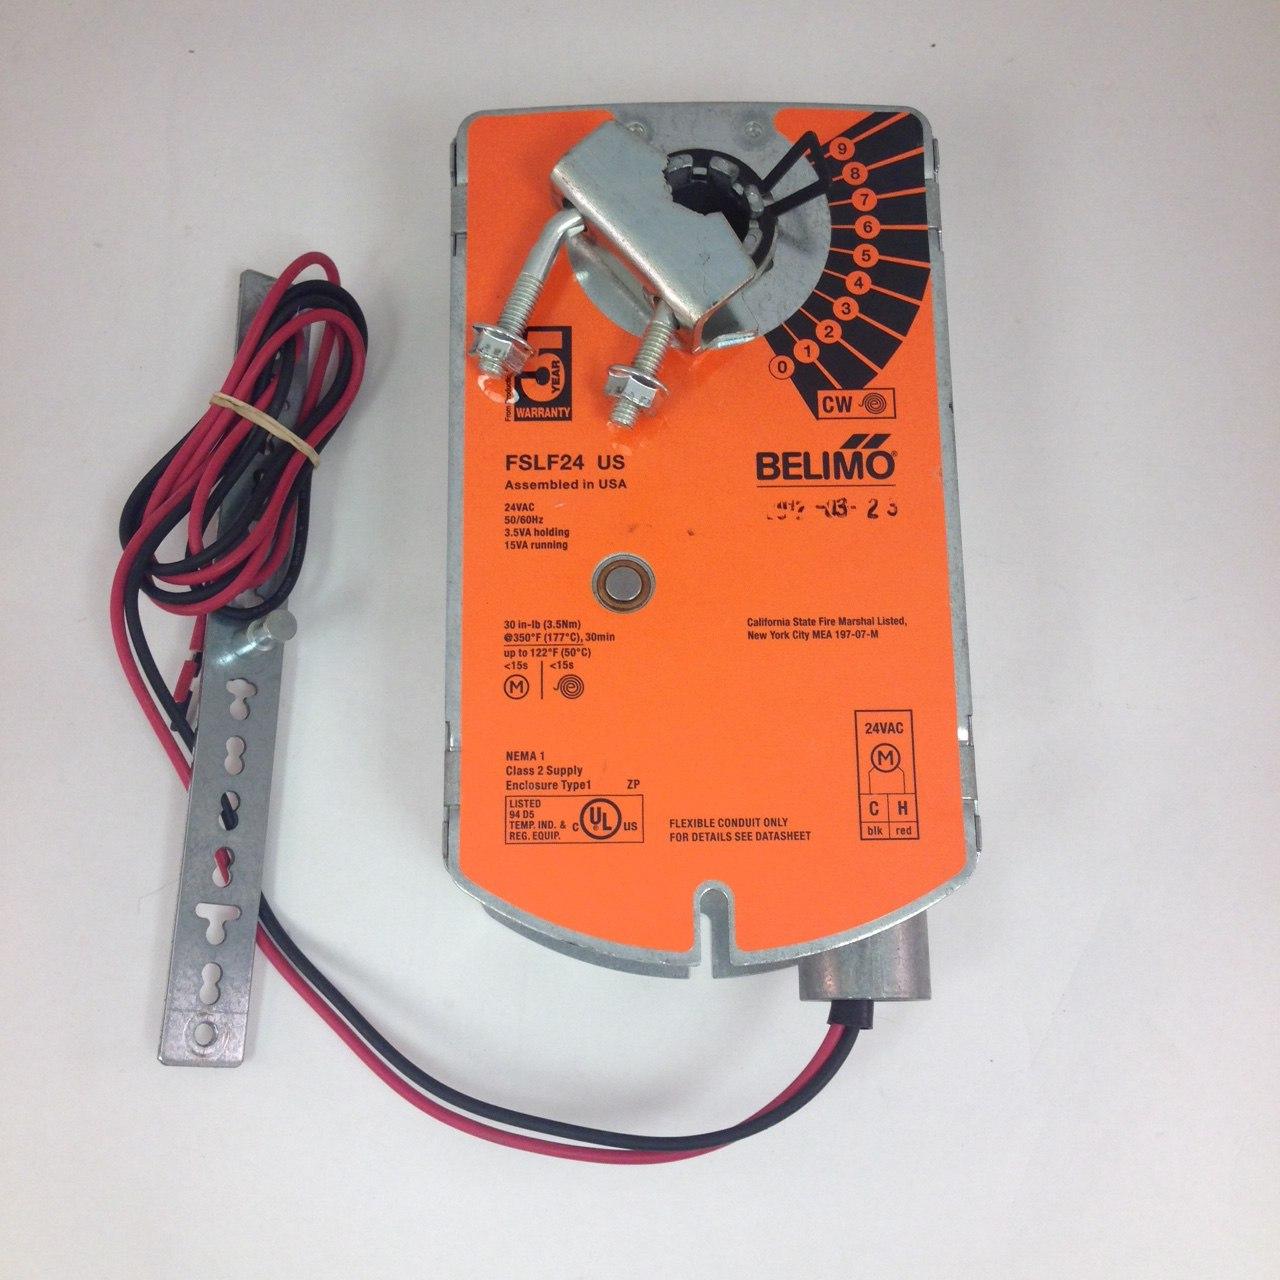 hight resolution of belimo damper actuator fslf24 us nos